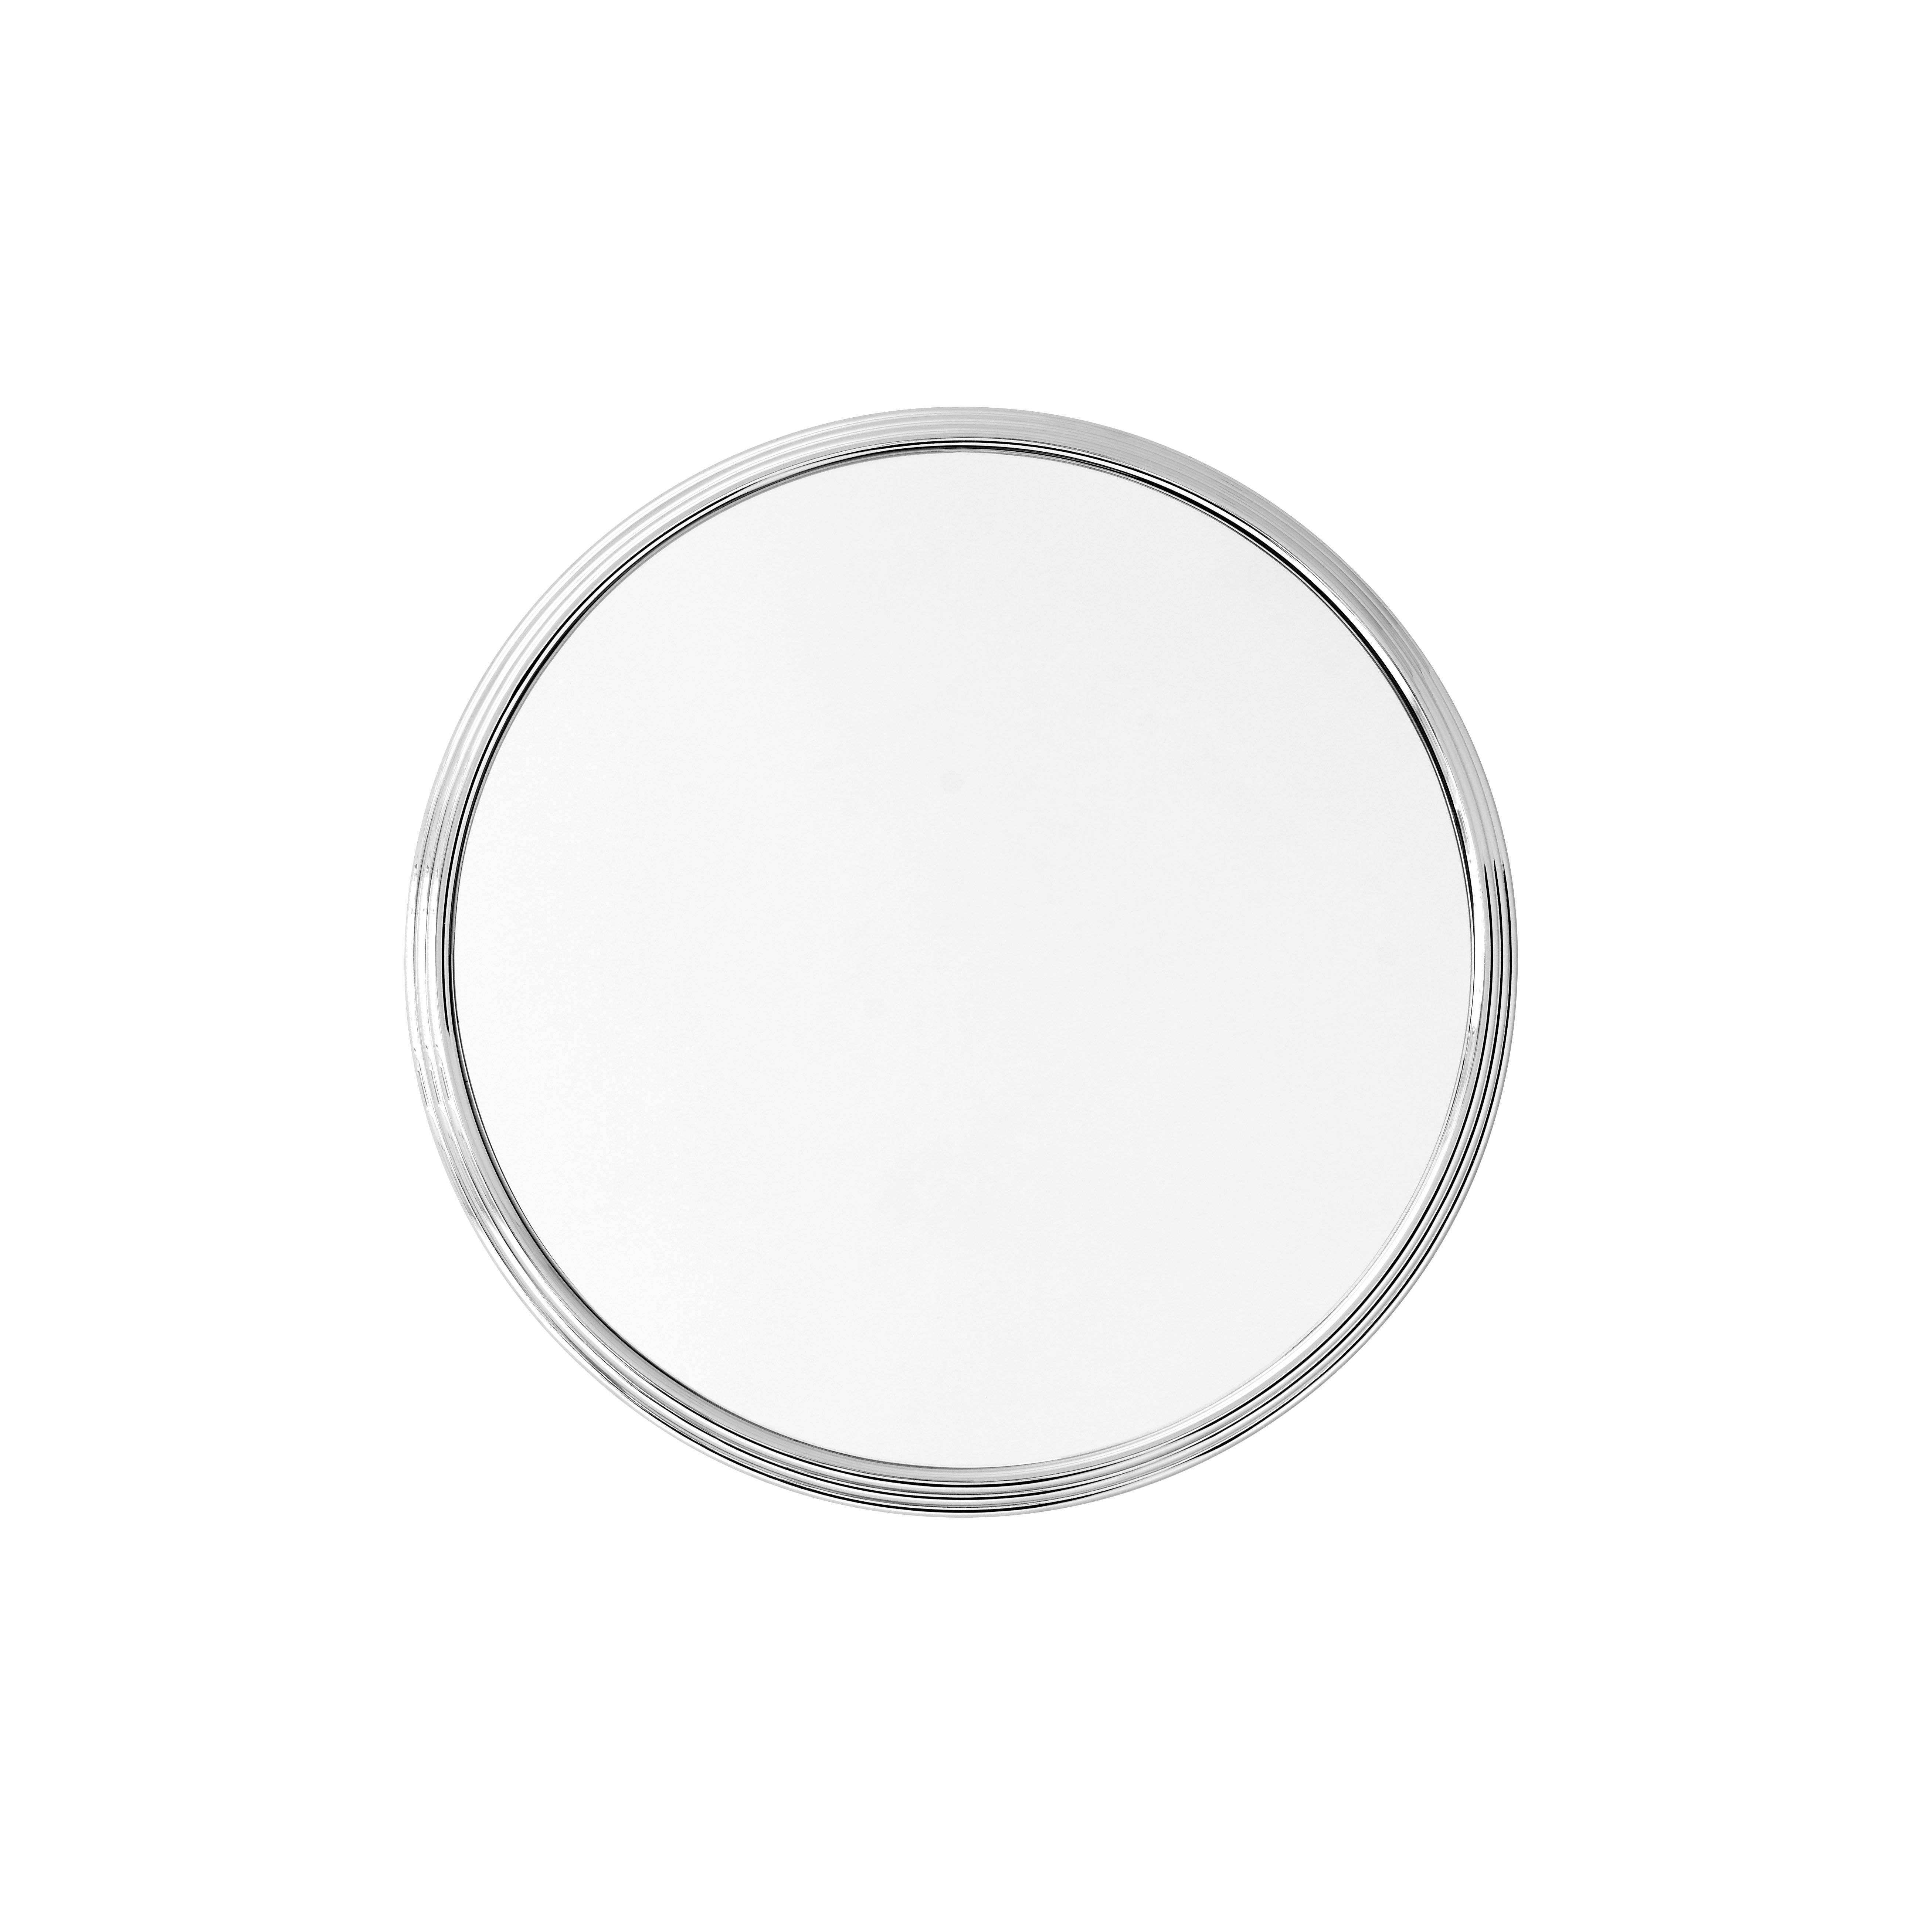 Decoration - Mirrors - Sillon SH4 Mirror - / Ø 46 cm by &tradition - Ø 46 cm / Chromed - Chromed steel